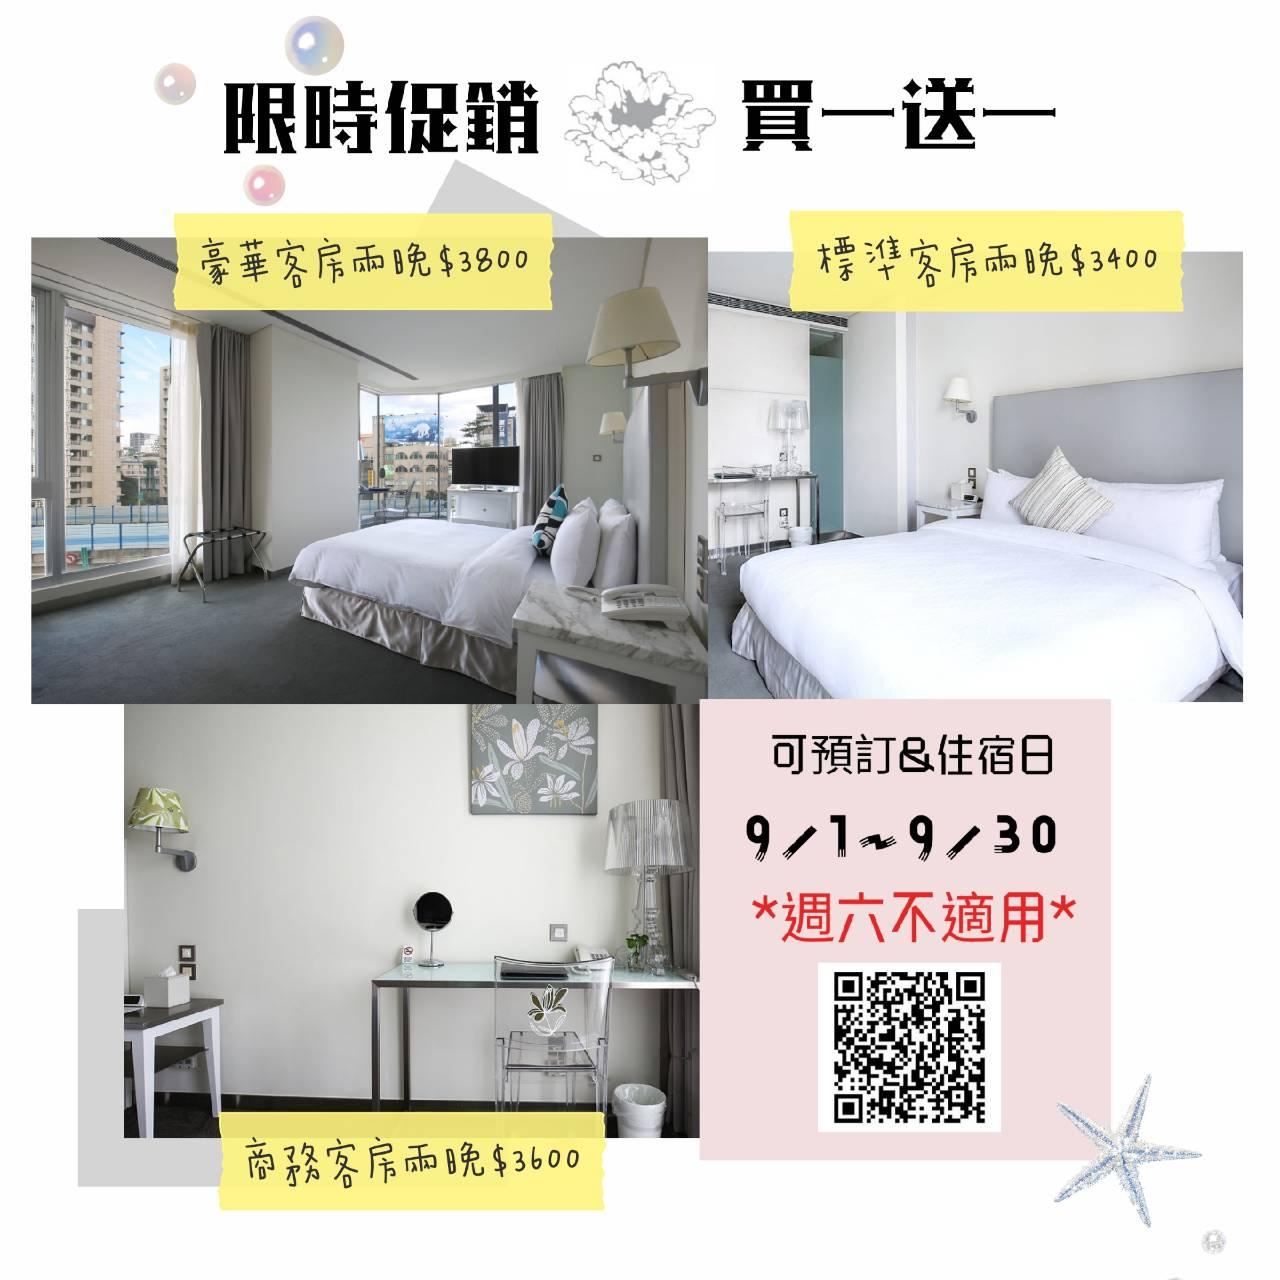 https://booking.taipeiinngroup.com/nv/images/suite/739.jpg